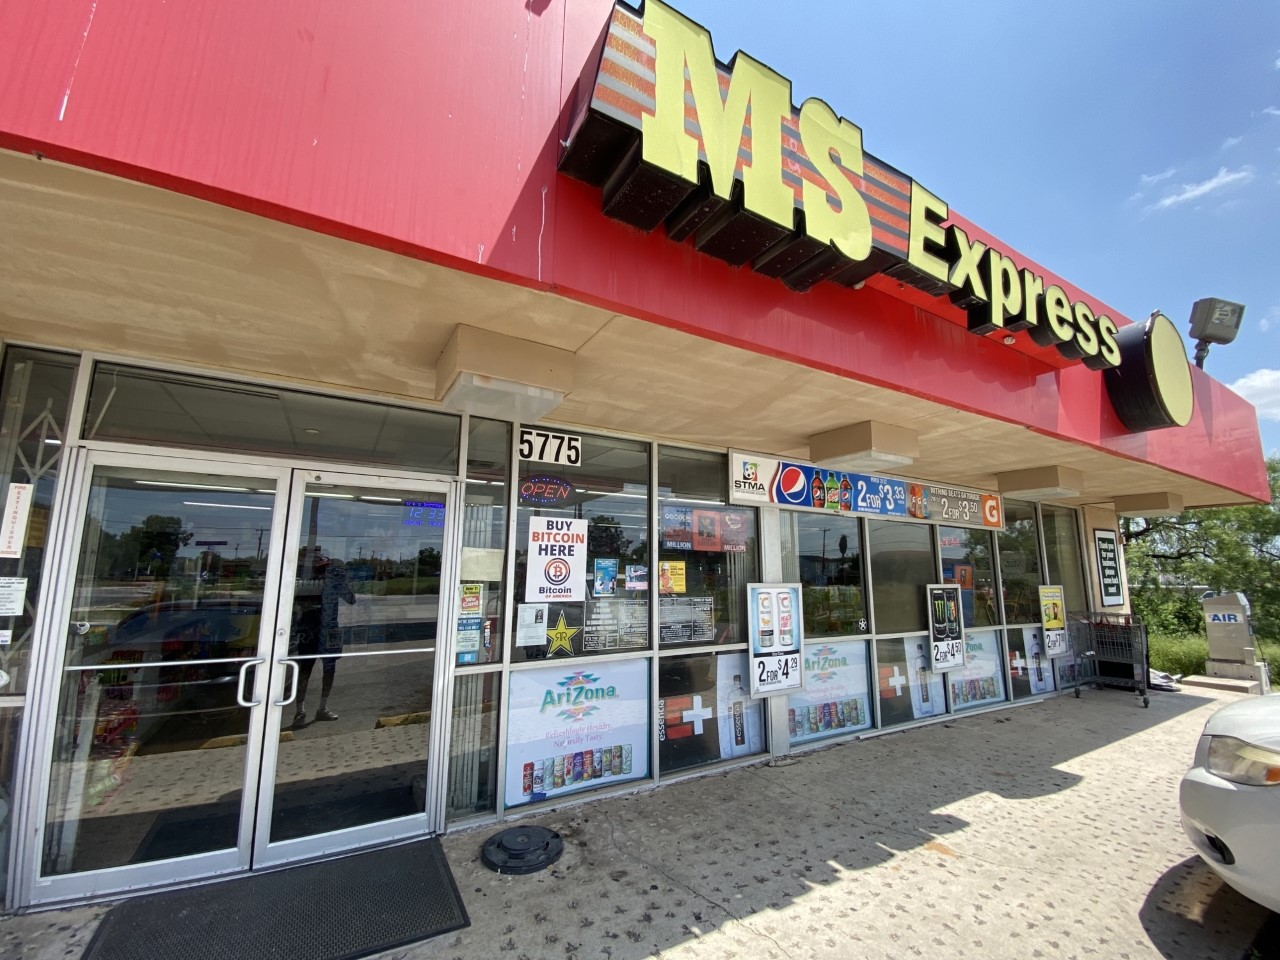 MS Express